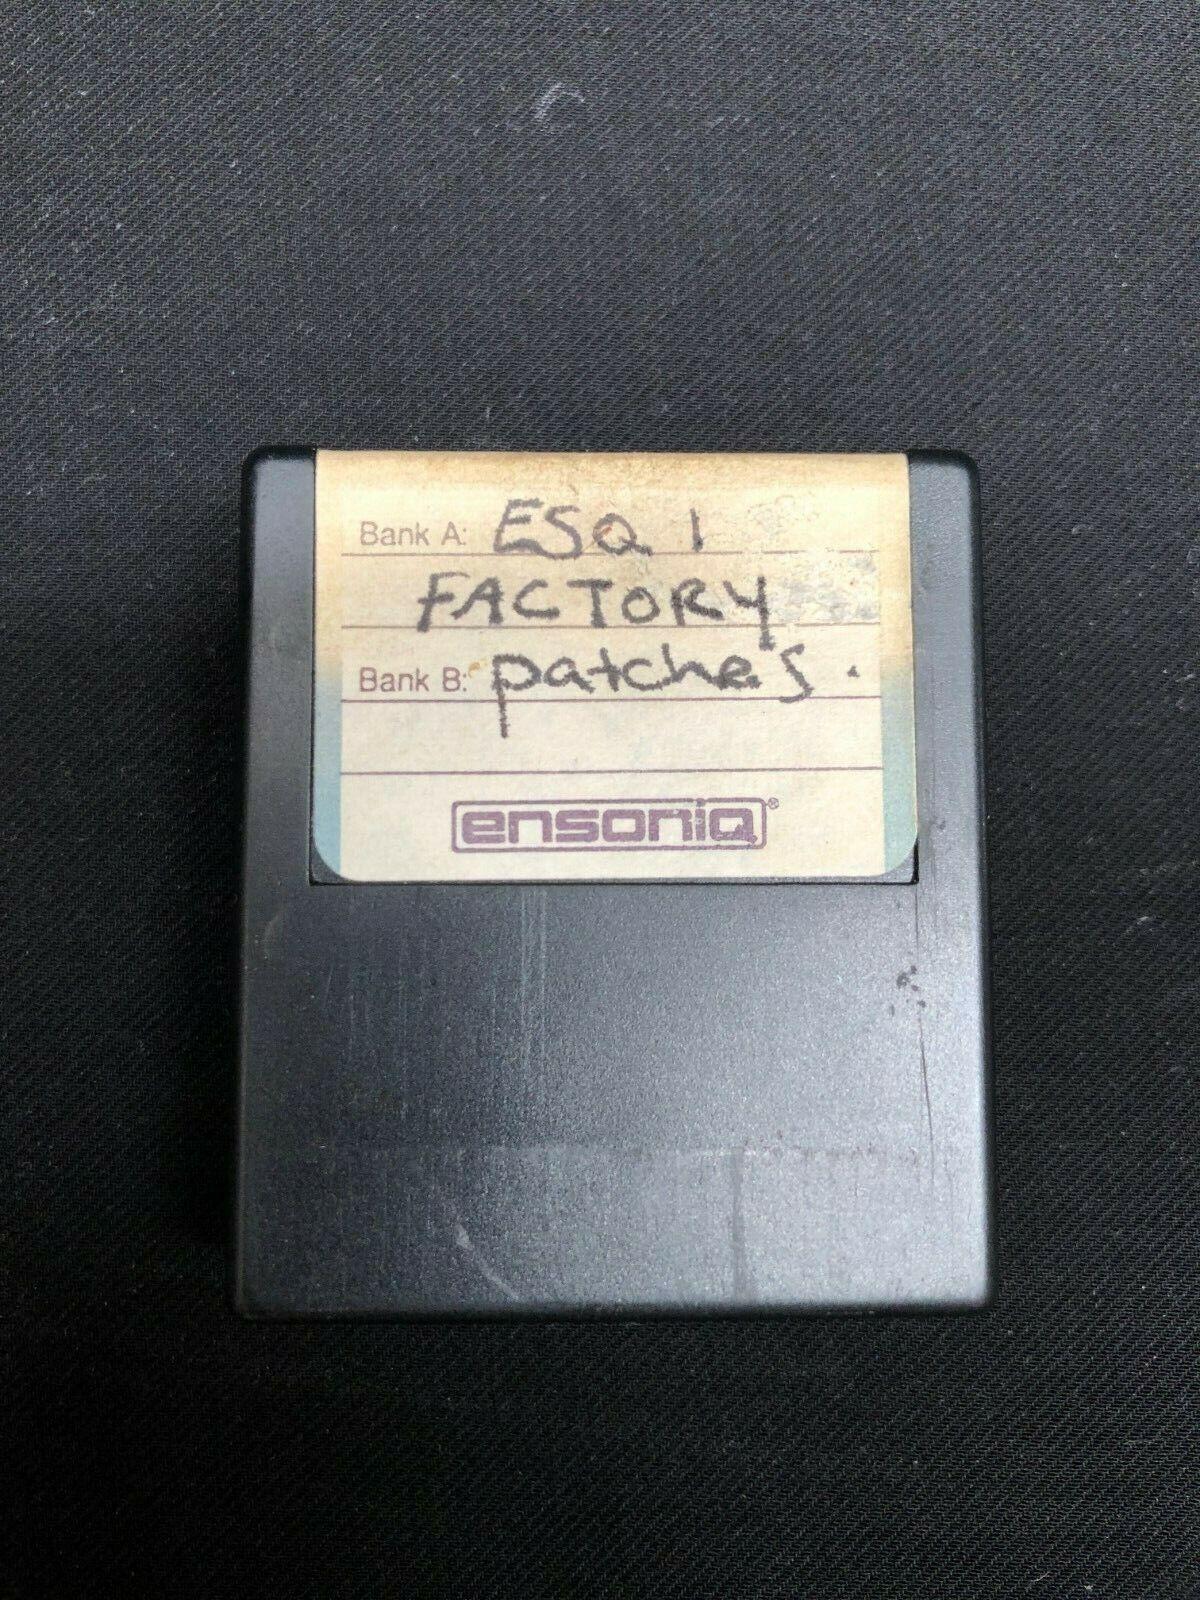 Ensoniq ESQ-1 Factory Sounds Cartridge - Data Rom Voices